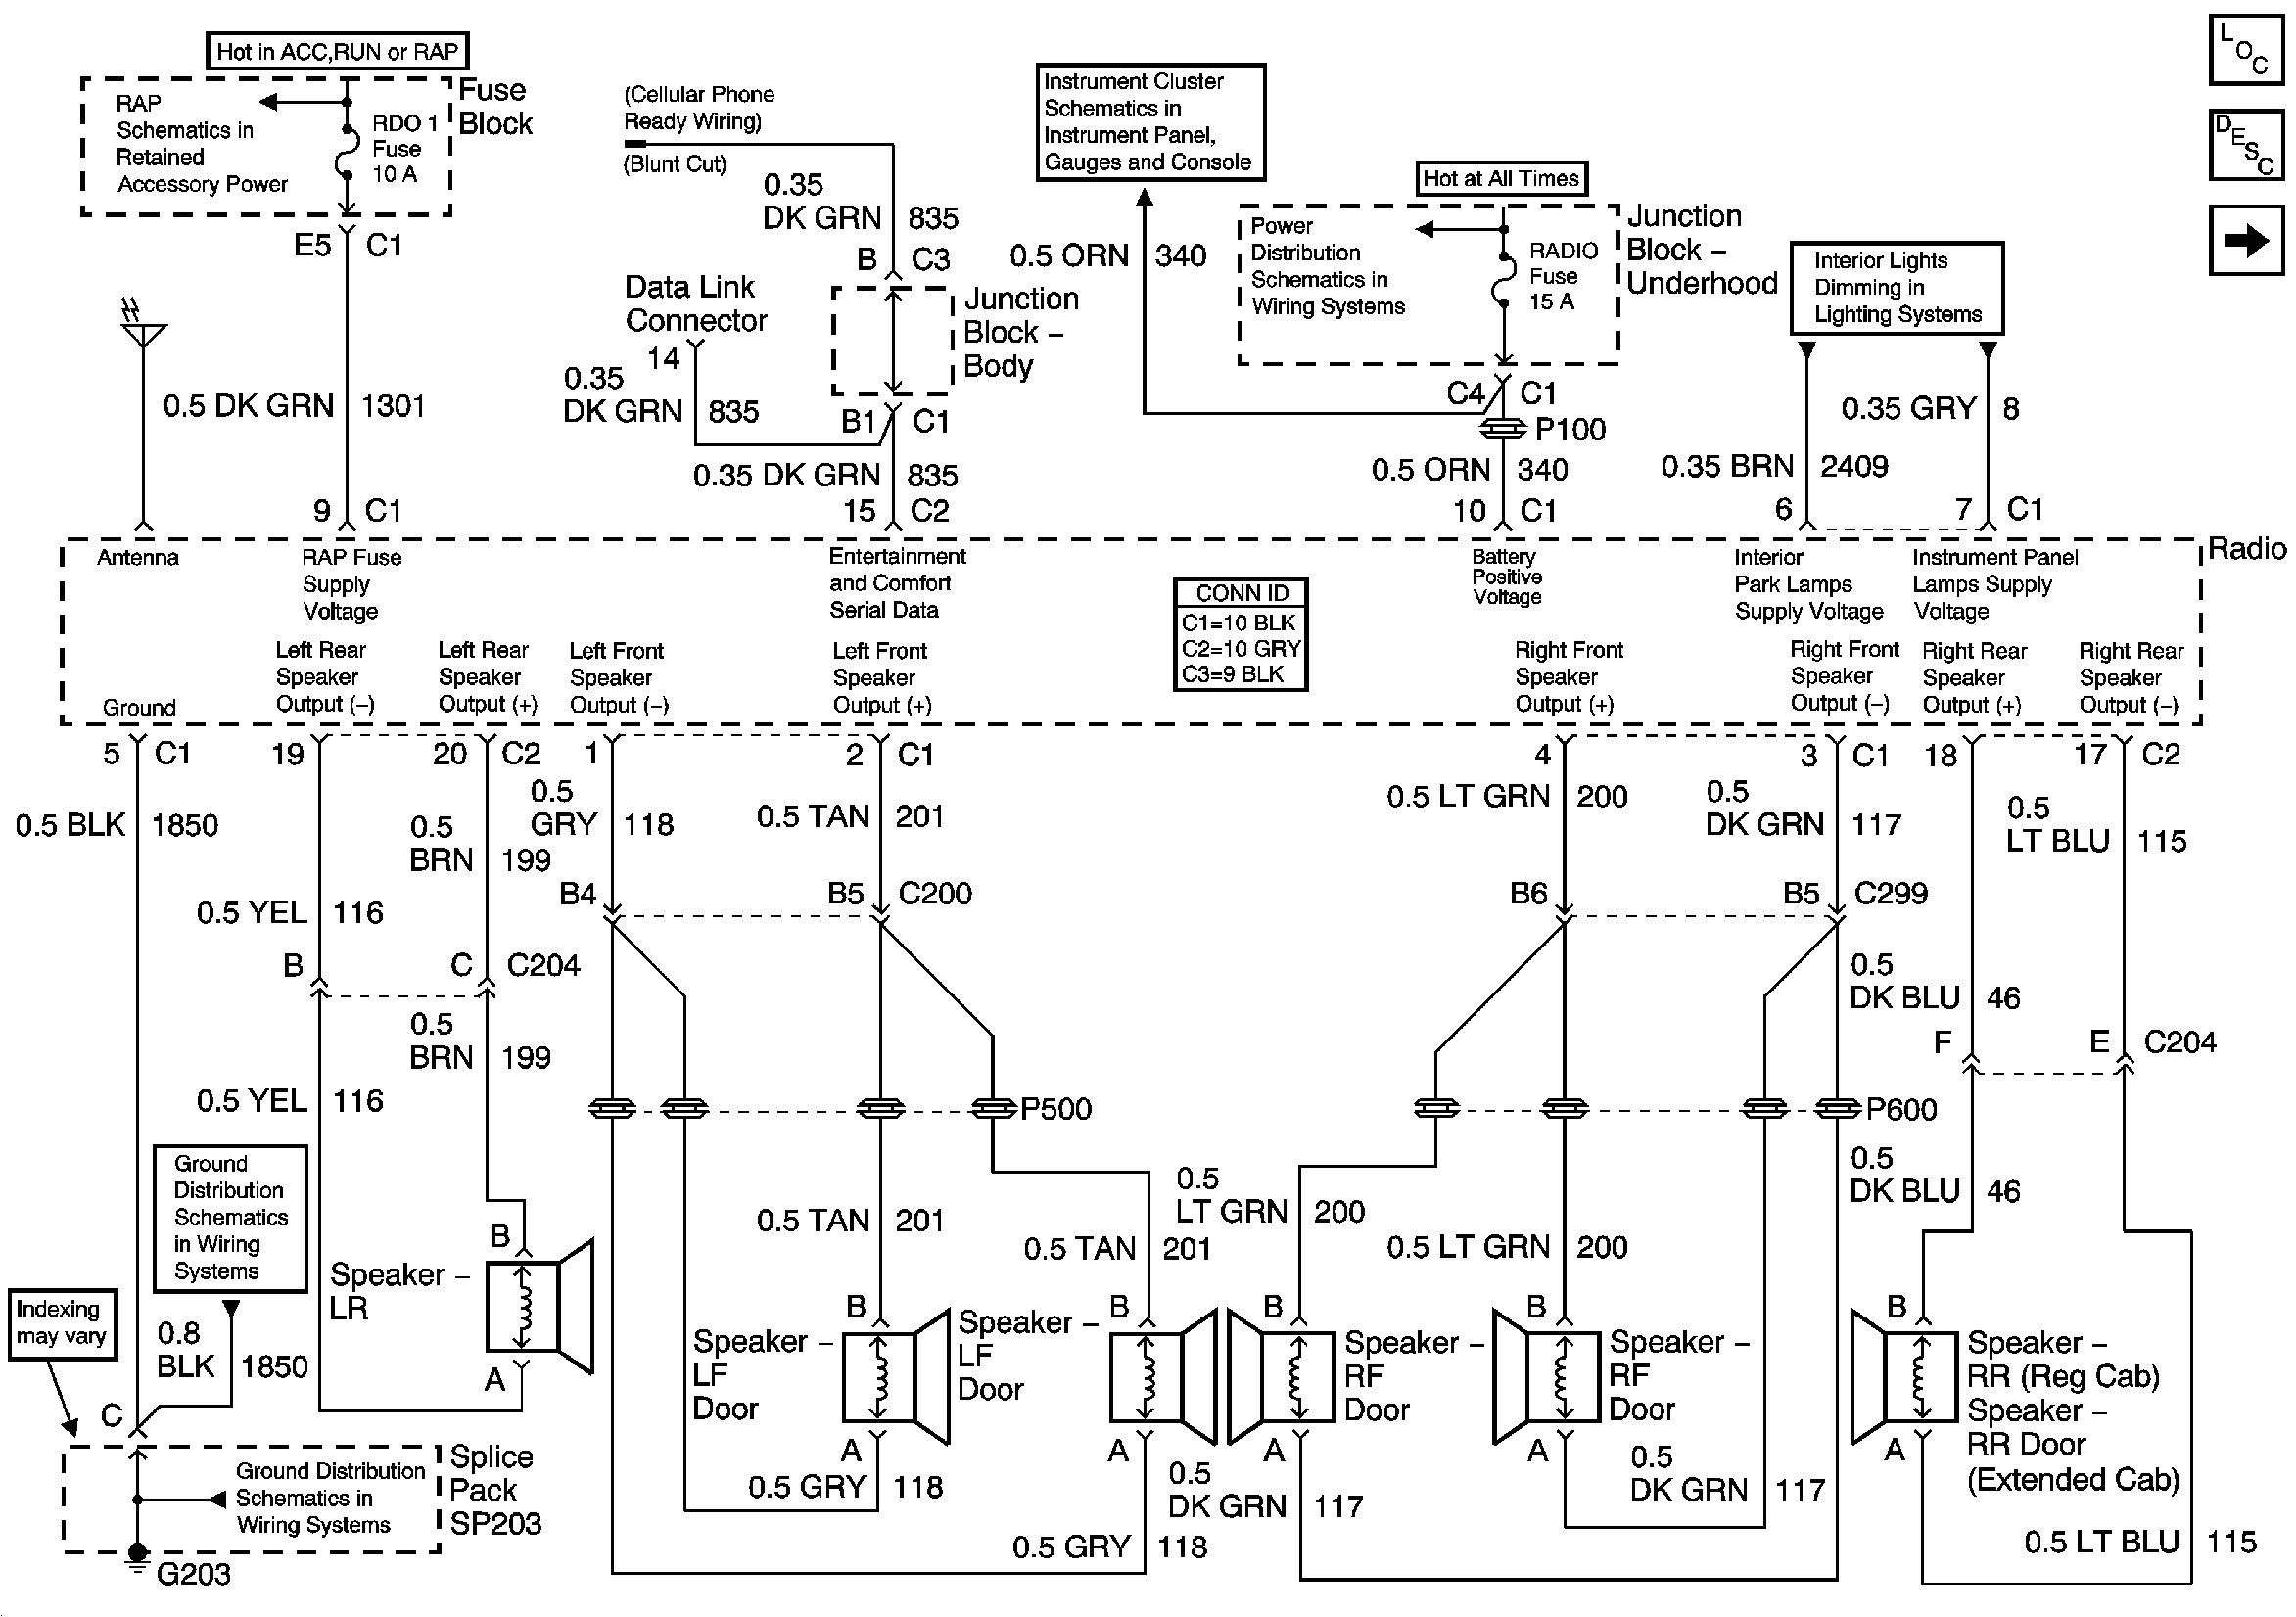 02 Chevy Silverado Radio Wiring Diagram 5e1c99 2001 Silverado Radio Wiring Diagram Wiring Library